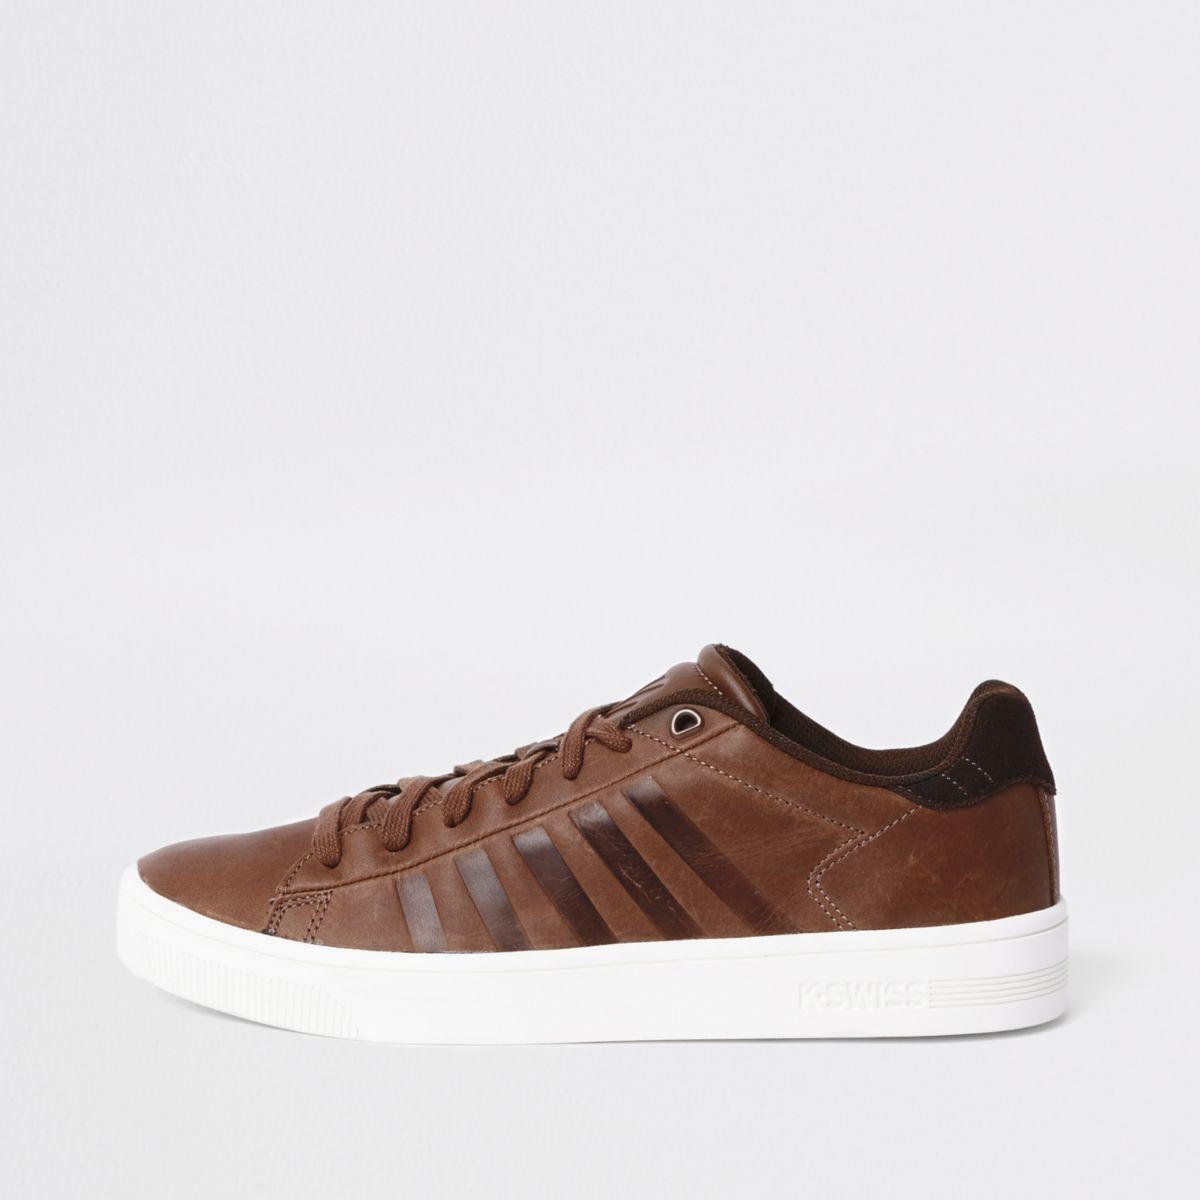 K-Swiss brown low top cupsole sneakers